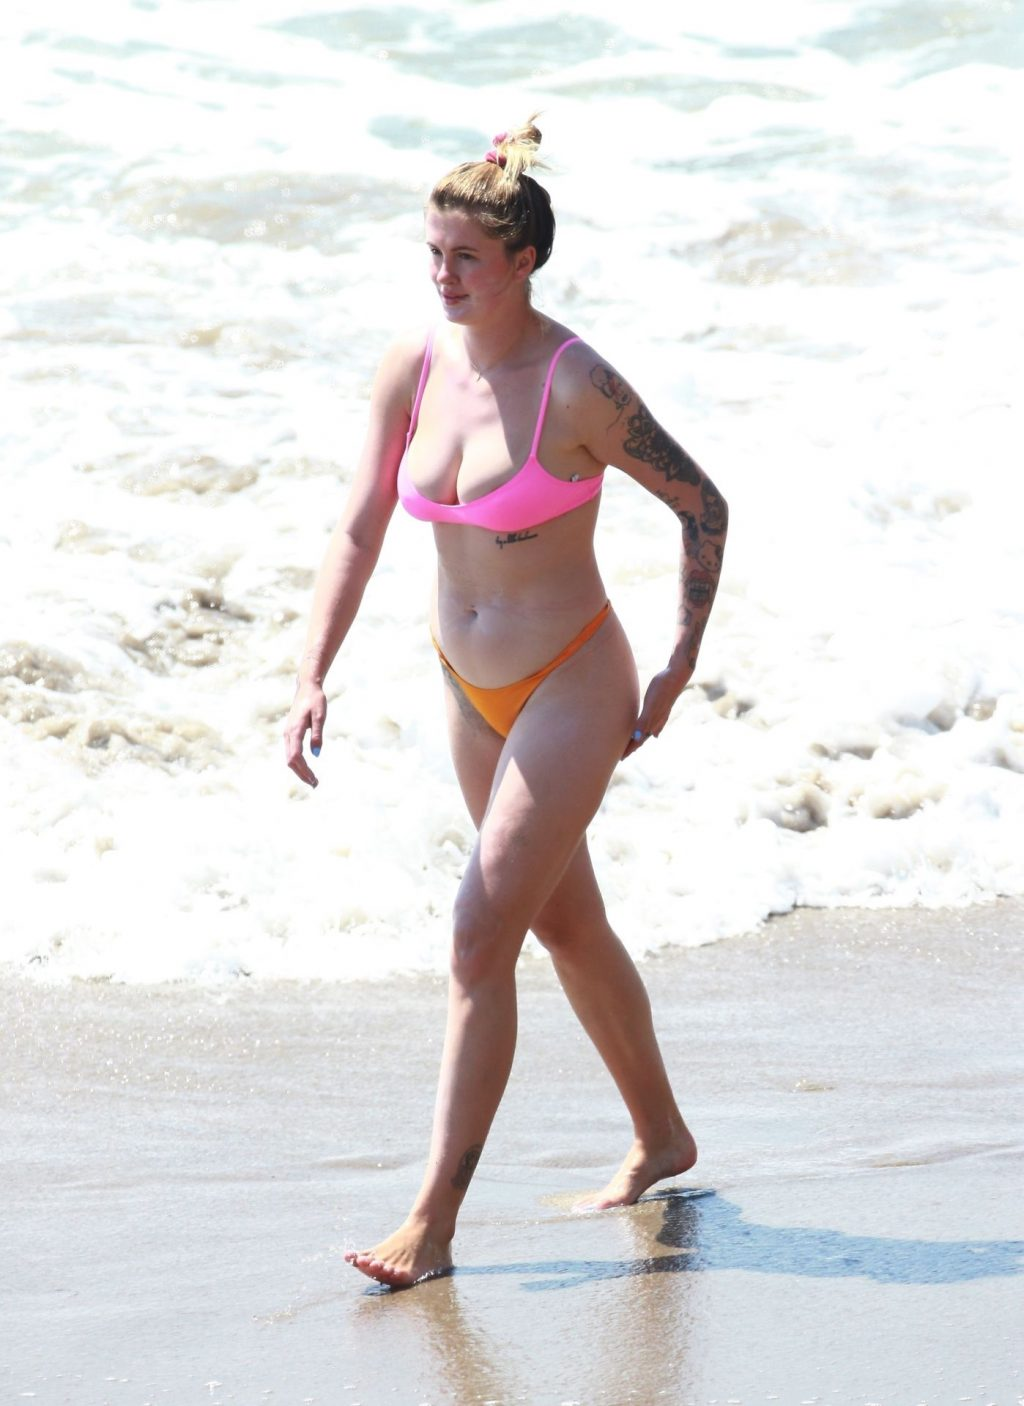 Ireland Baldwin Beats the Heat in Her Bikini at the Beach (34 Photos)